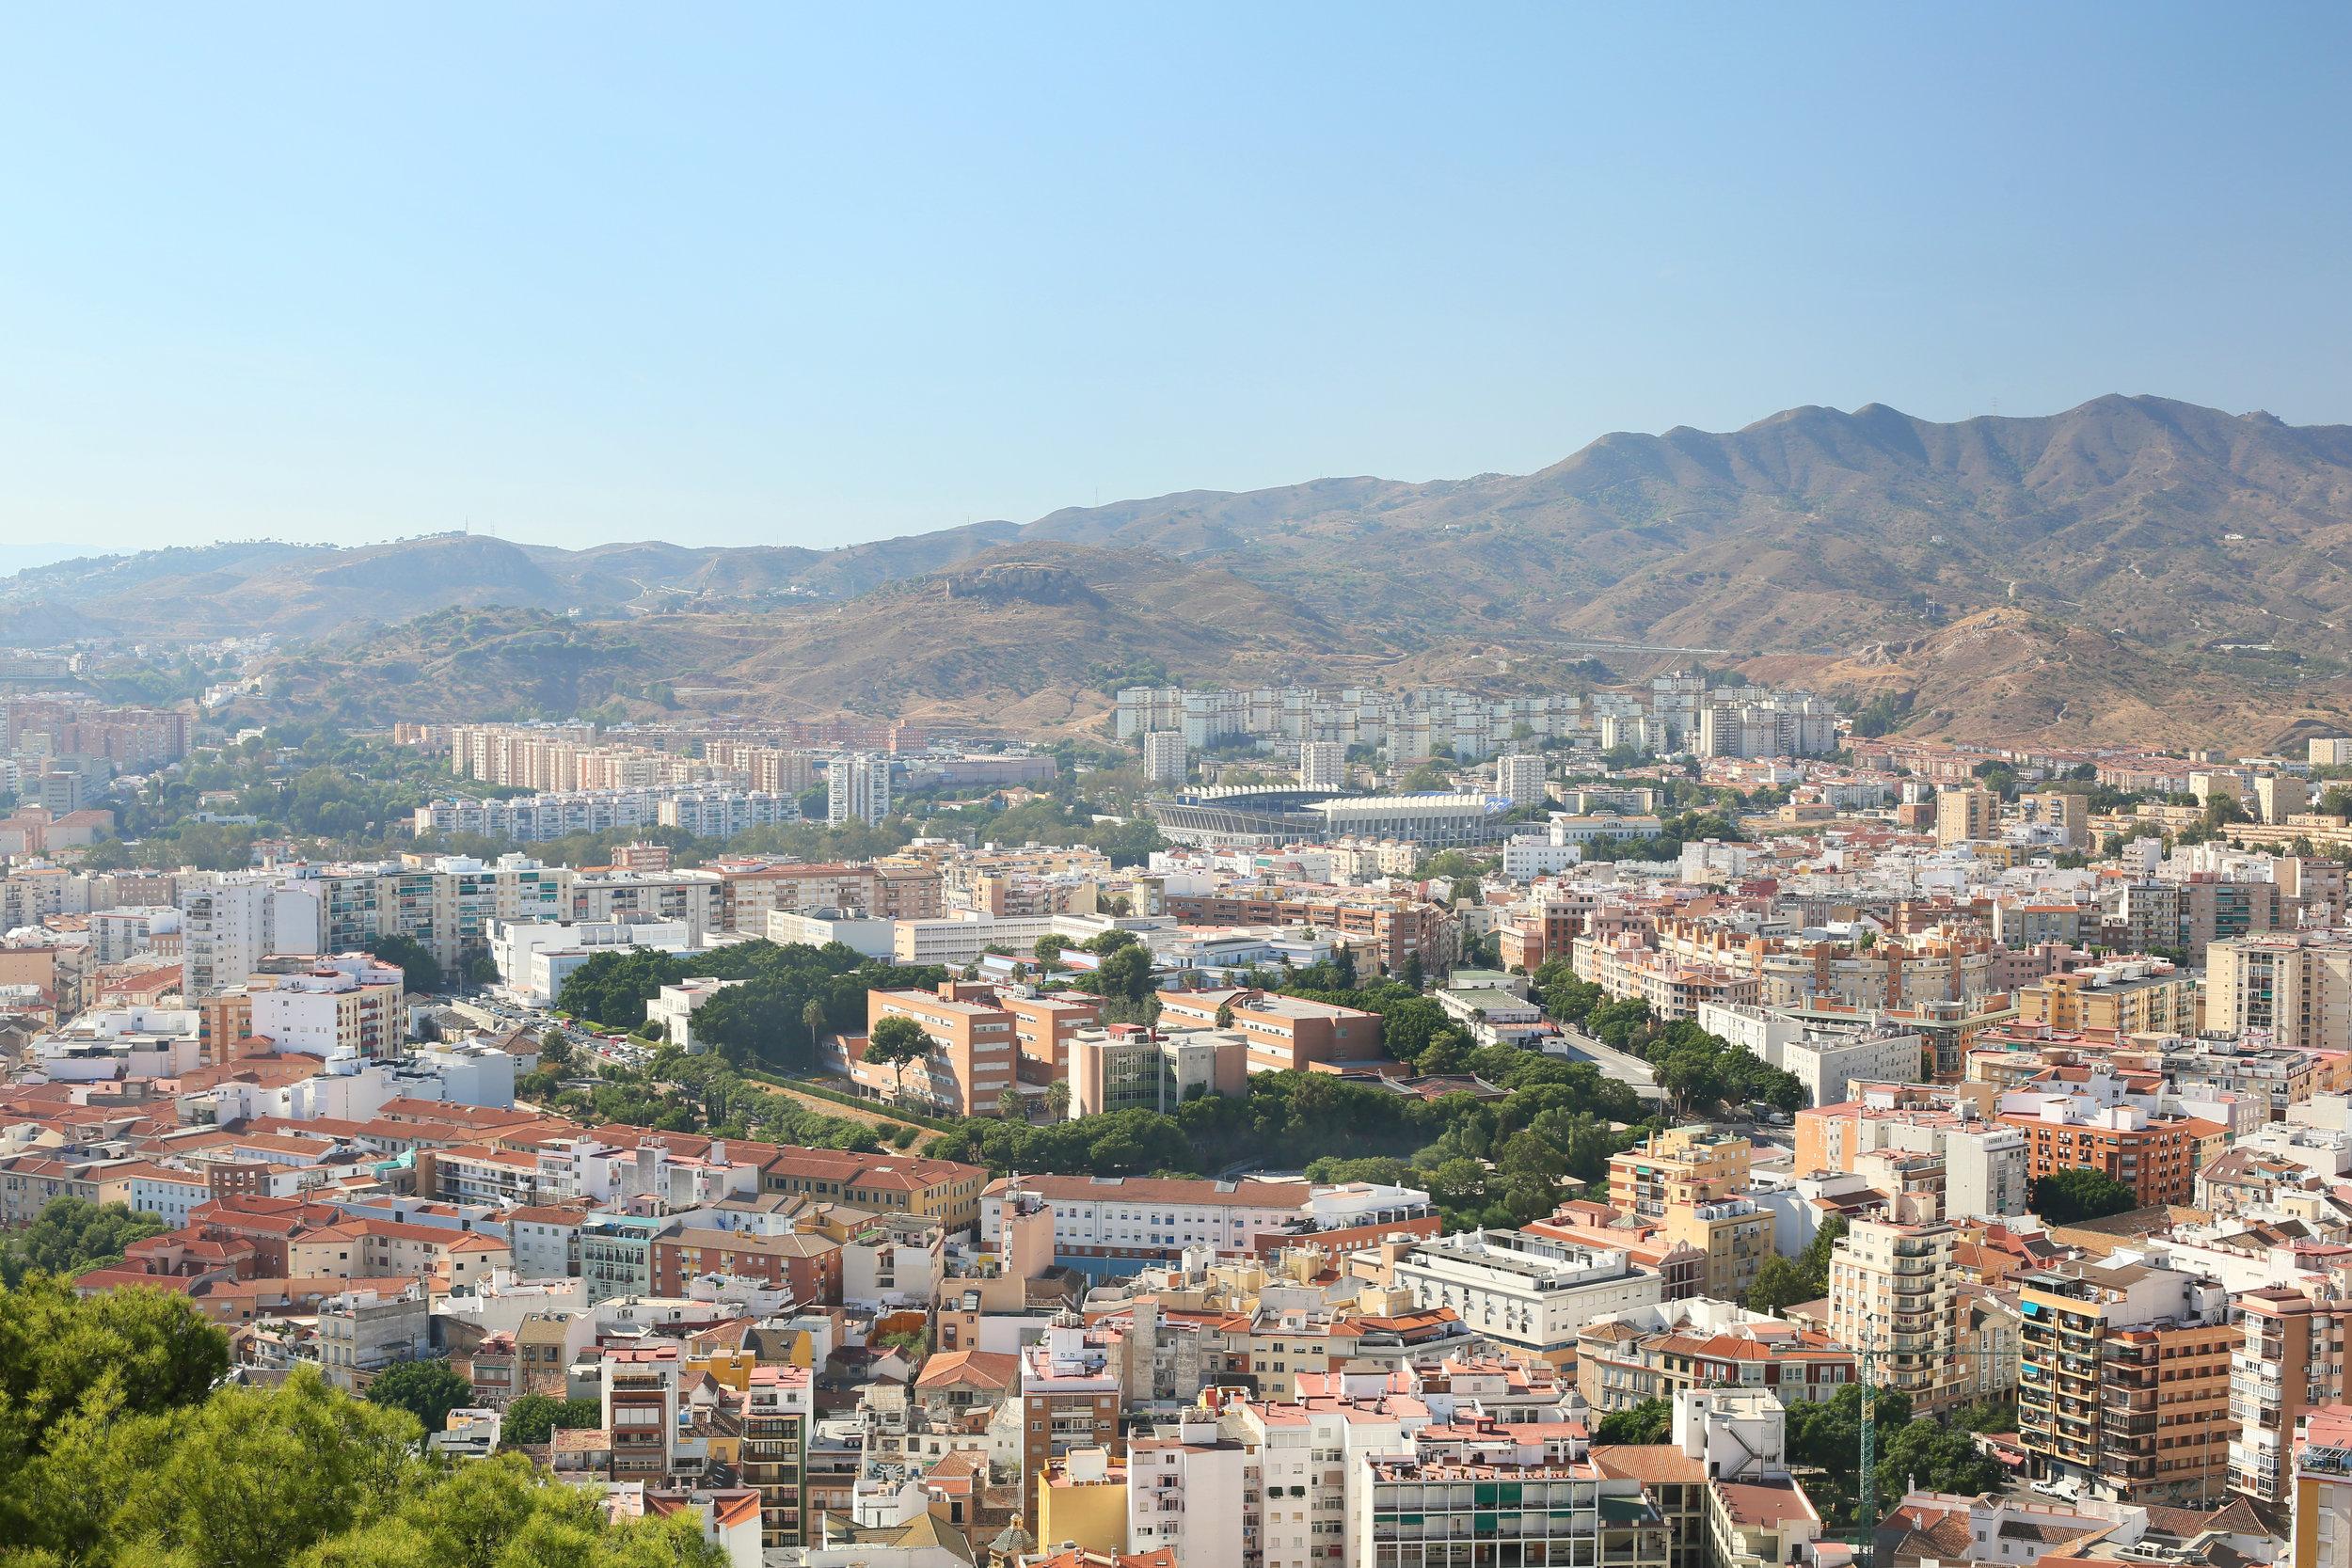 Views from the Gibralfaro